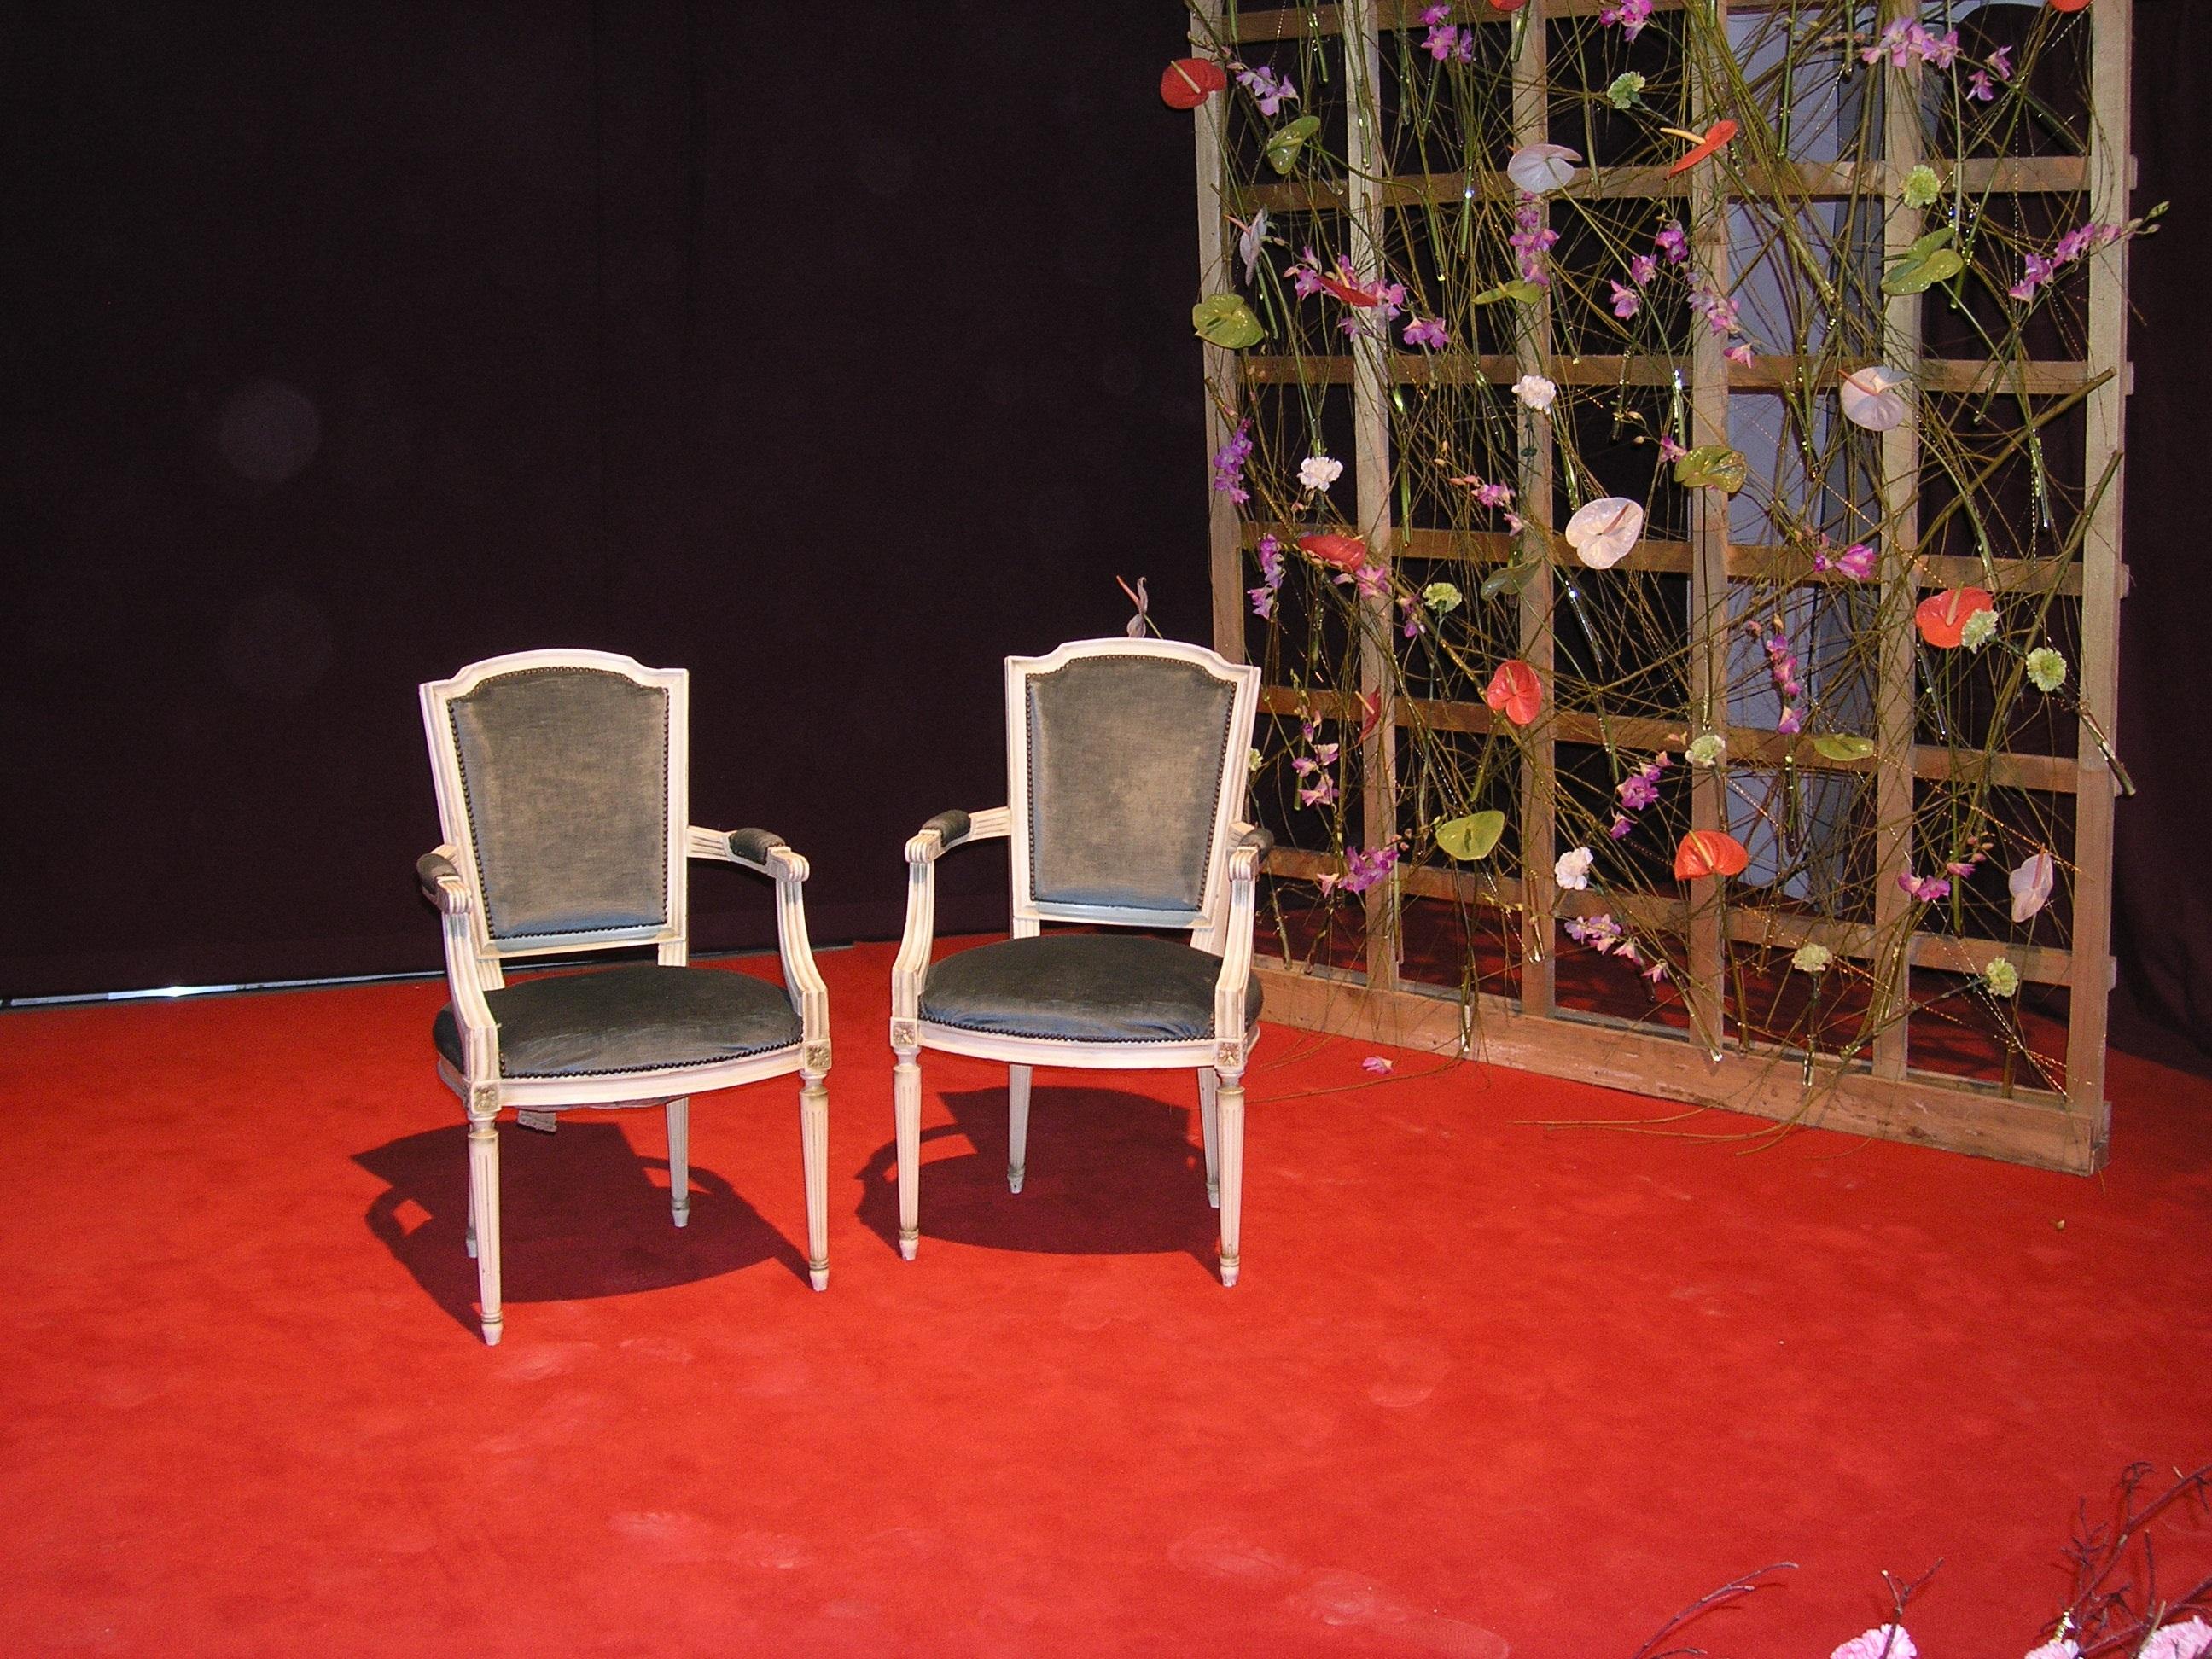 Chair Furniture Still Life Chairs Art Stage Flooring Green Week